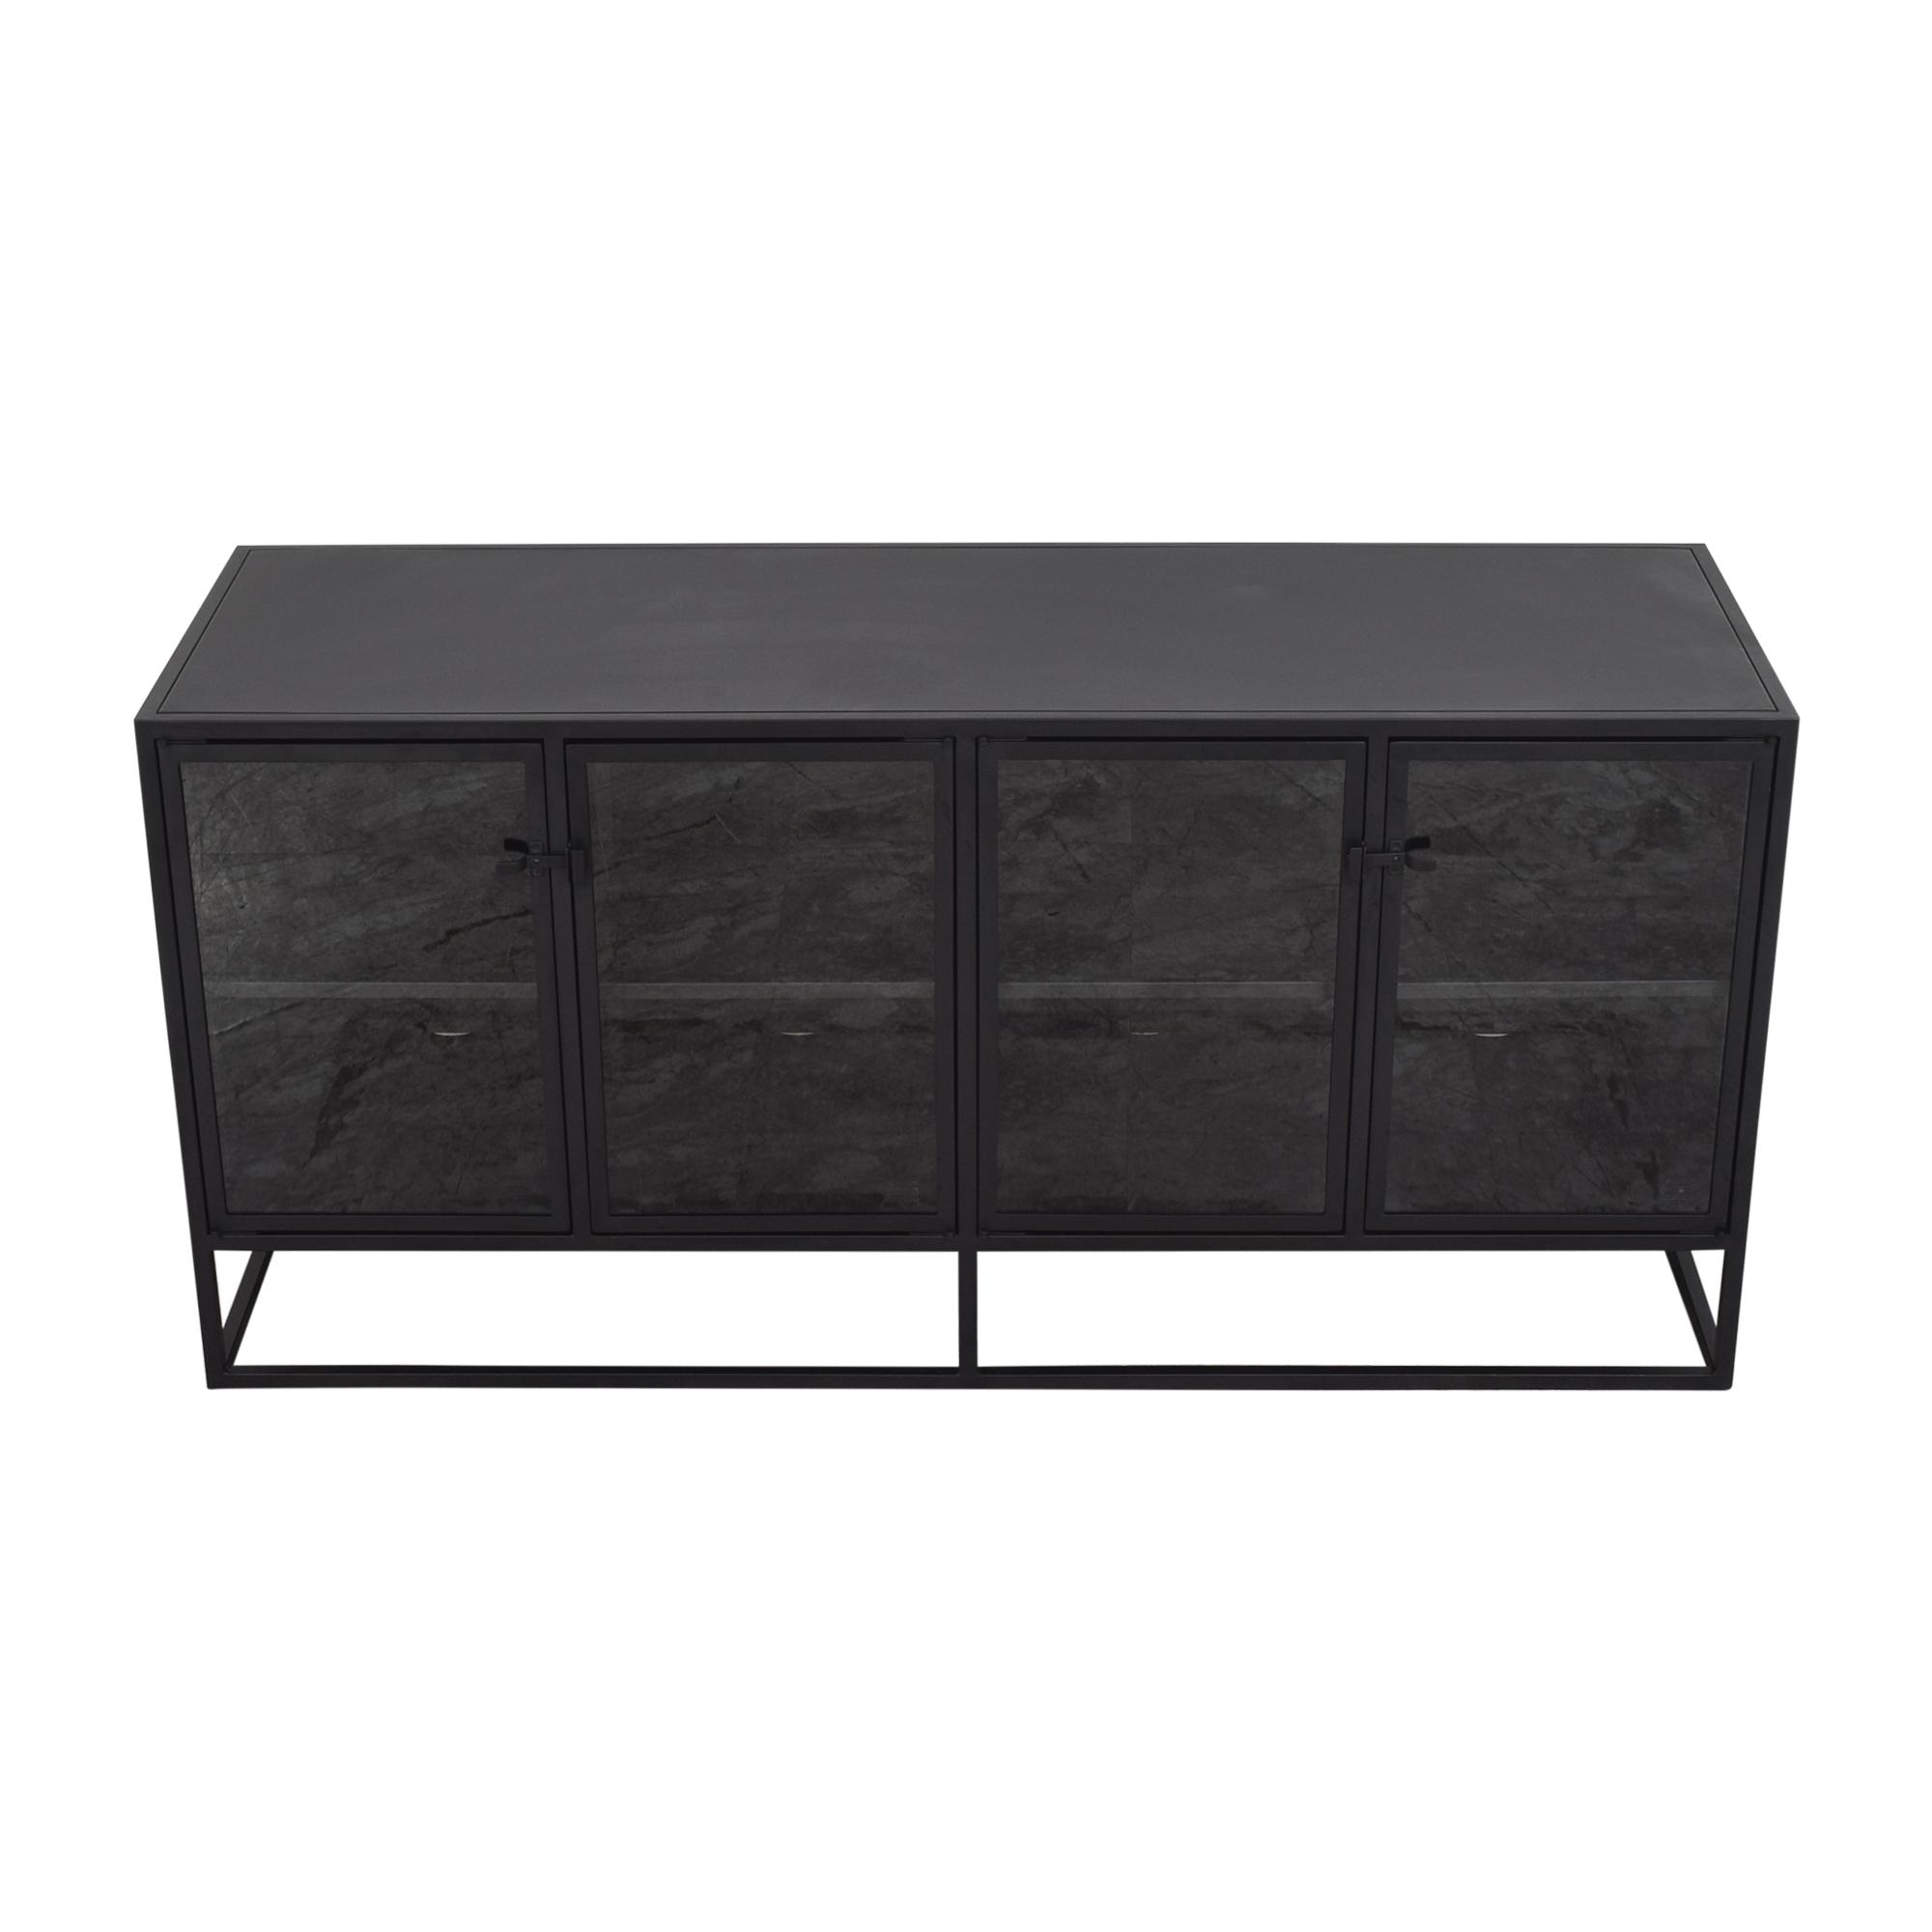 Crate & Barrel Crate & Barrel Casement Large Sideboard Storage